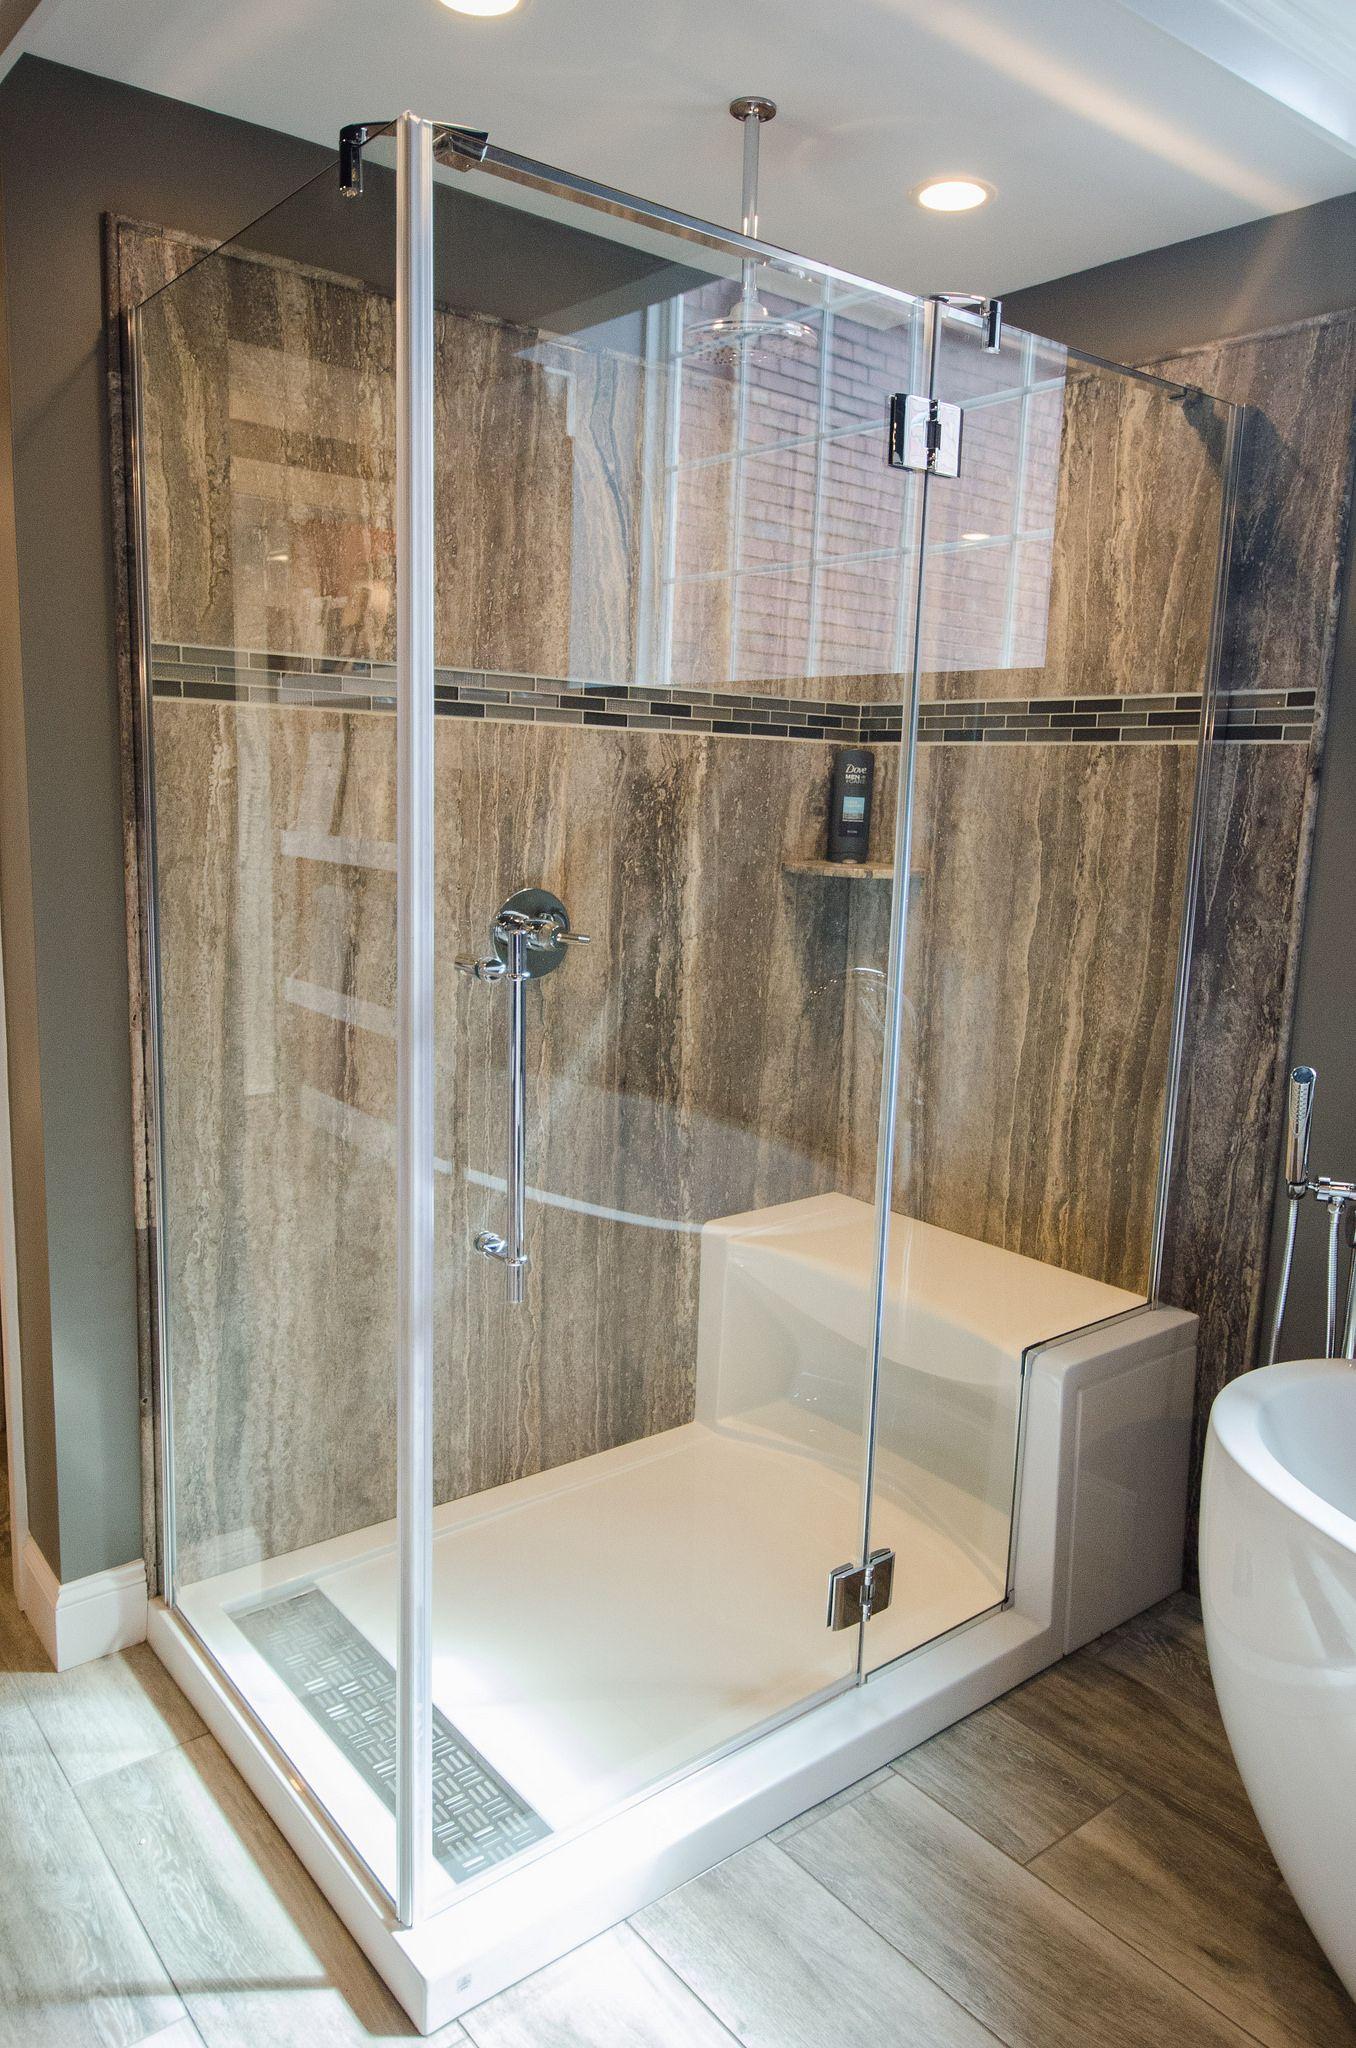 Showroom0631 in 2020 Grab bars in bathroom, Bath